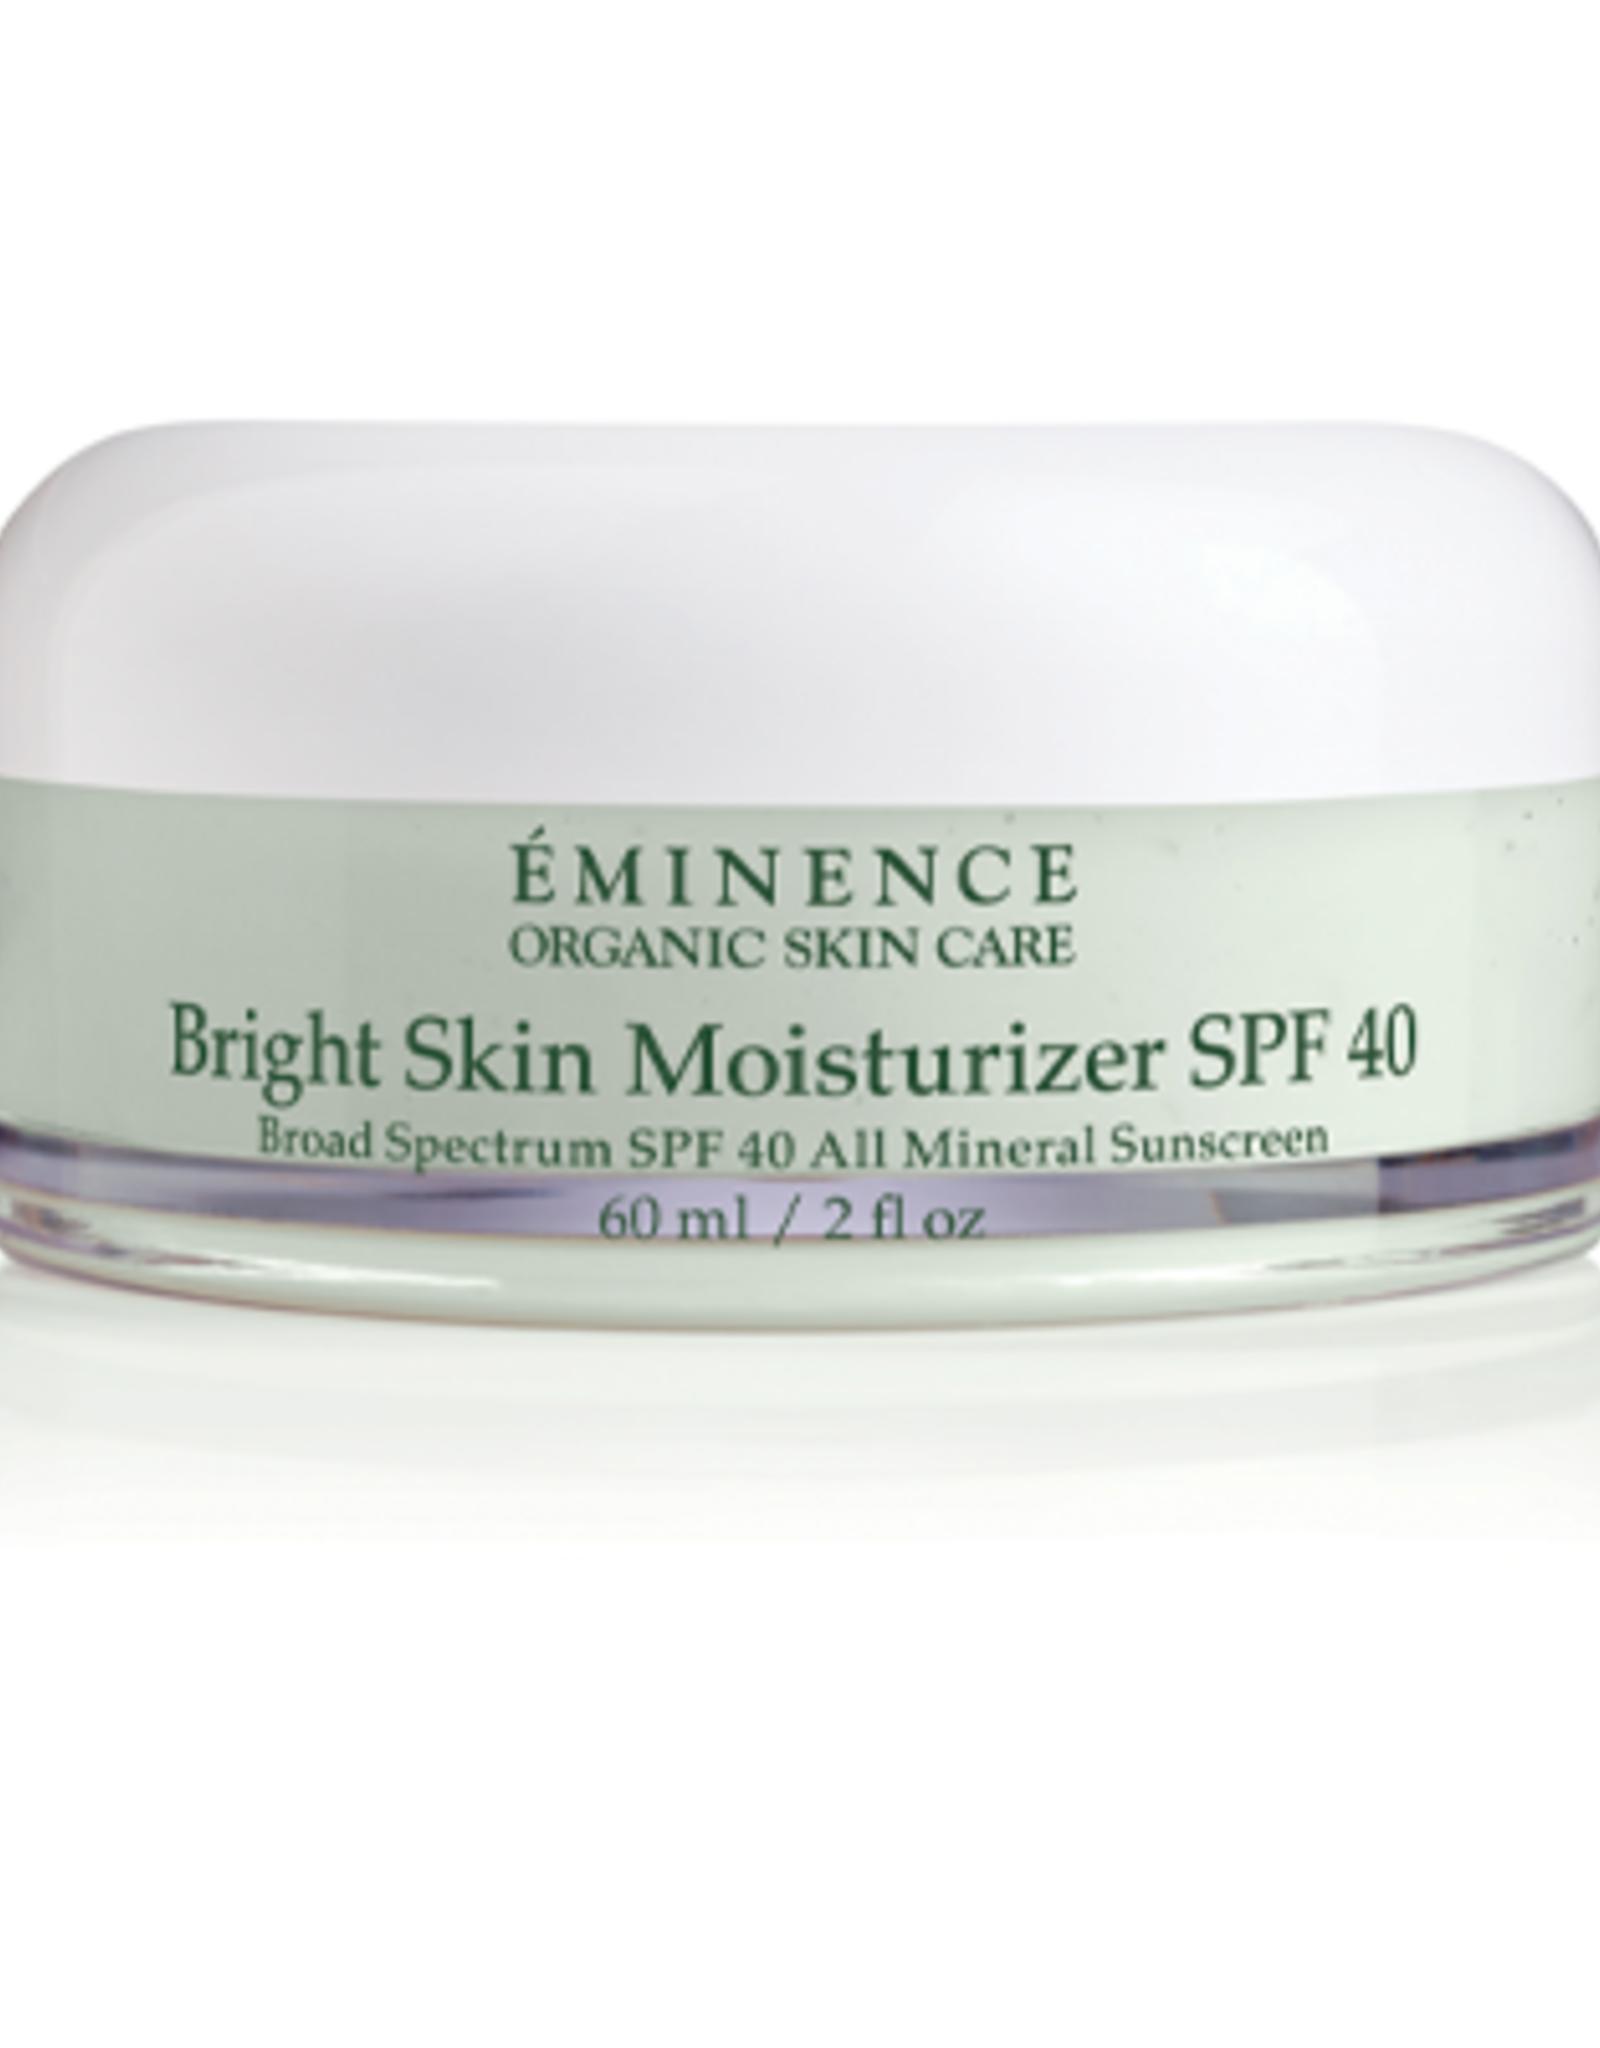 Eminence Organic Skin Care Bright Skin Moisturizer SPF 40